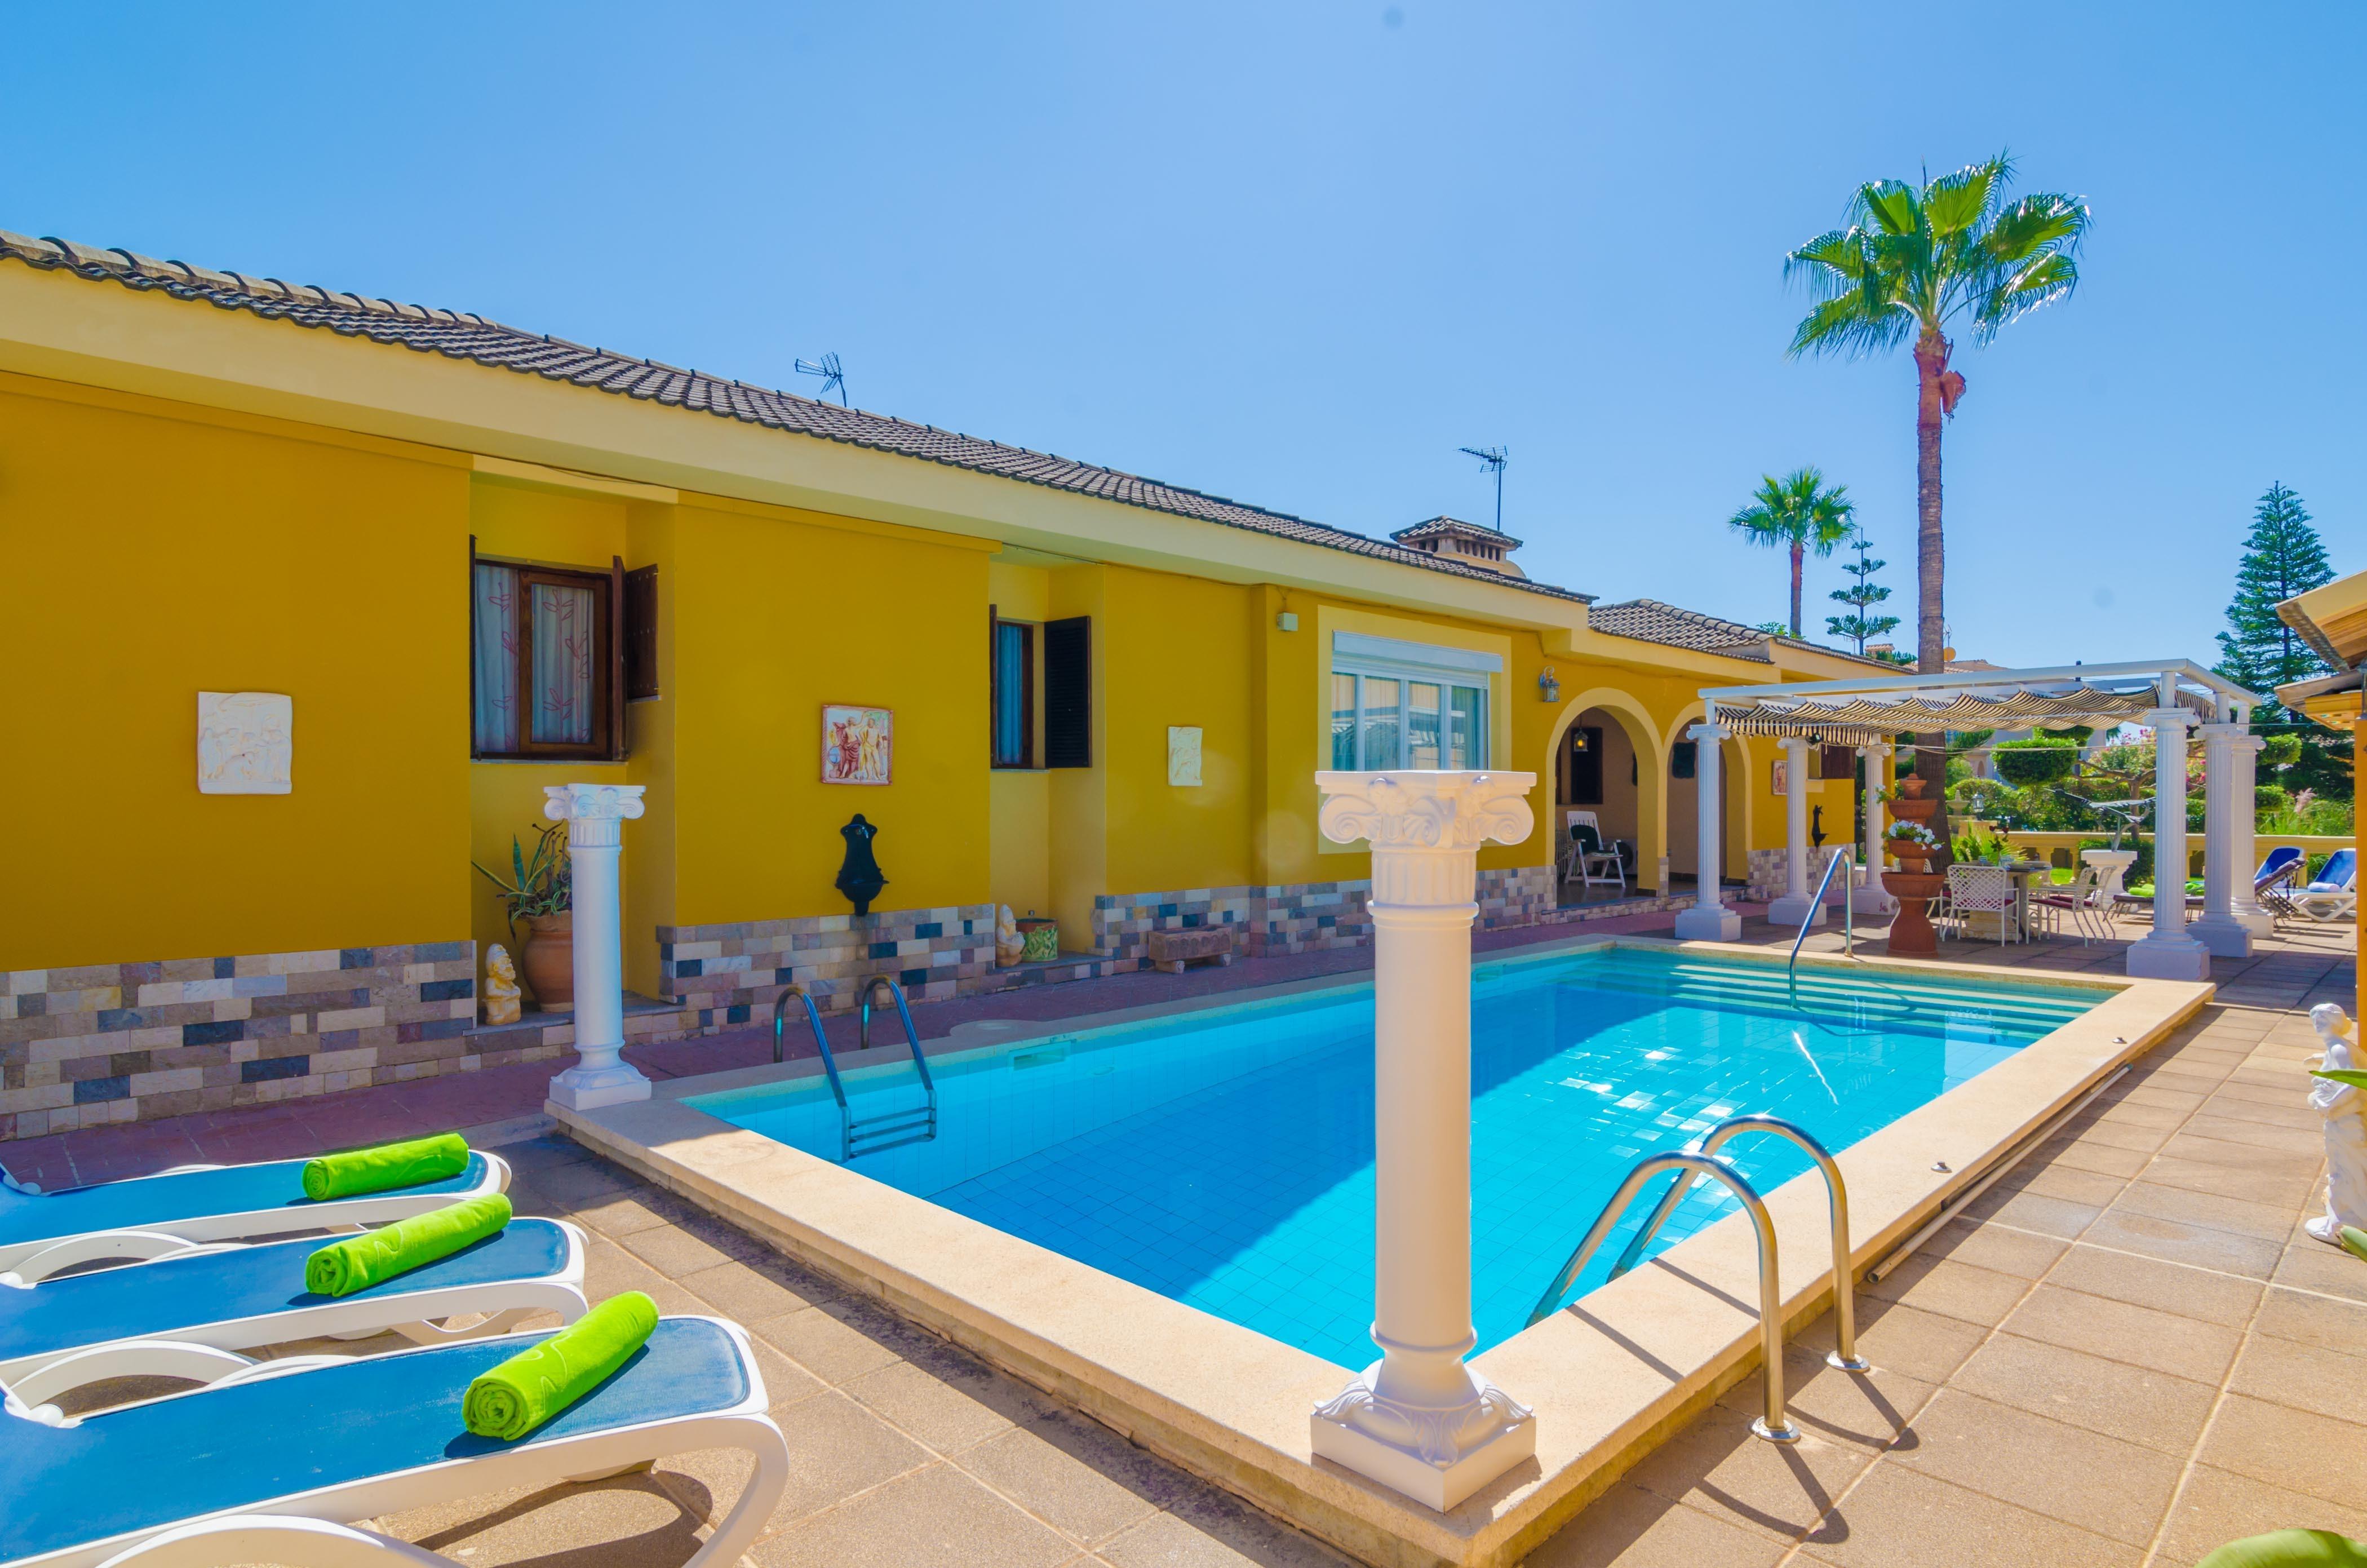 Ferienhaus CAN GORI (2296828), Badia Gran, Mallorca, Balearische Inseln, Spanien, Bild 1